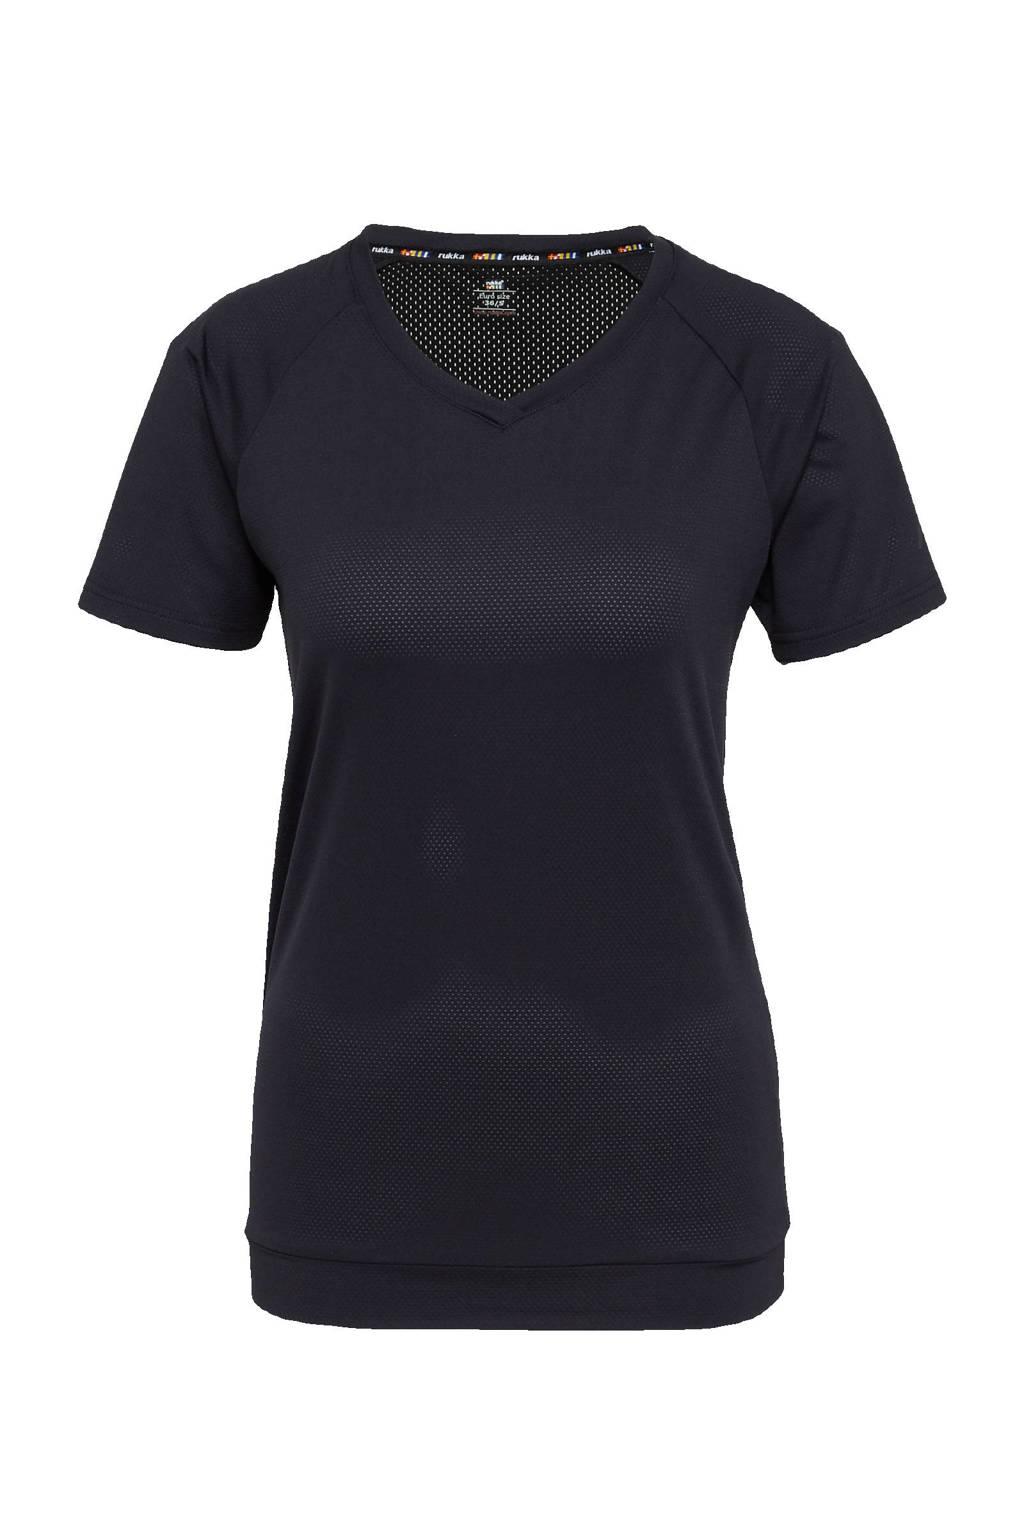 Rukka sport T-shirt antraciet, Antraciet